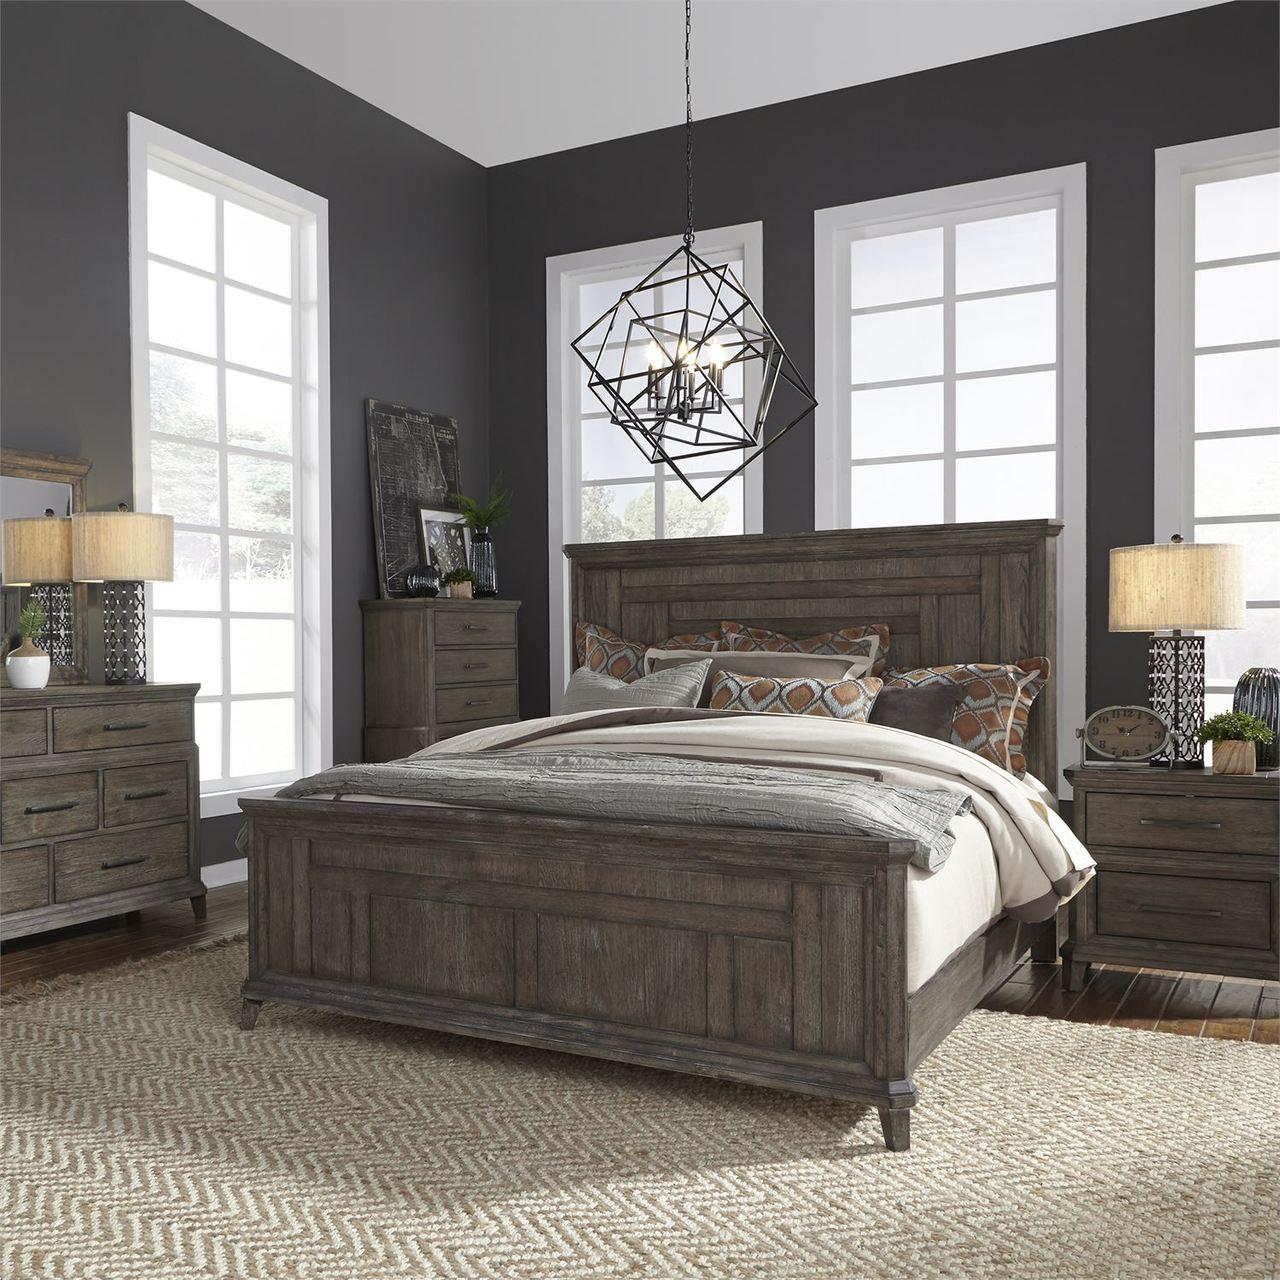 Oak Bedroom Sets | Aged Oak Bedroom Set Free Shipping